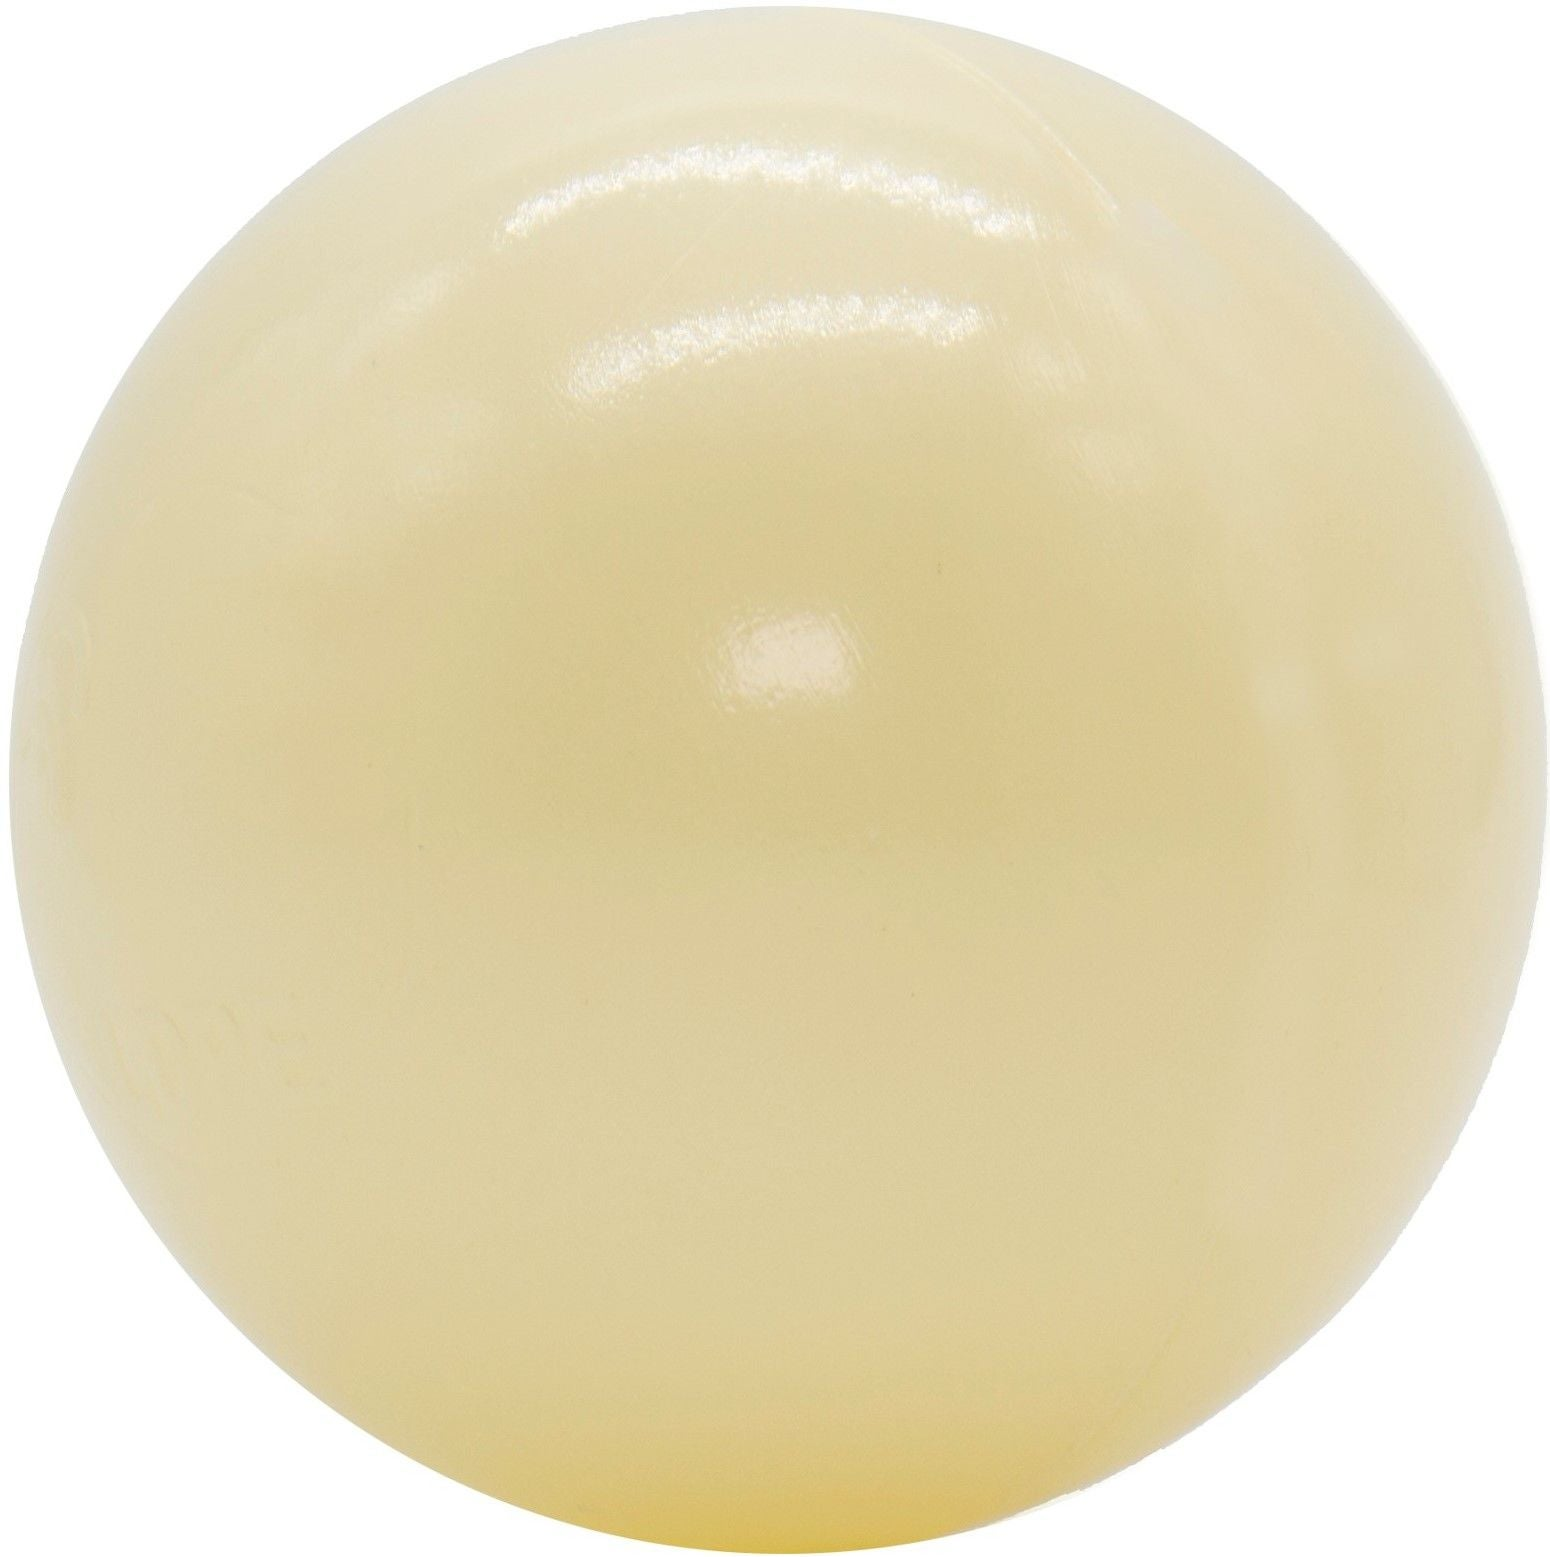 KIDKII Extra Bollar 50 st, Pearl Yellow